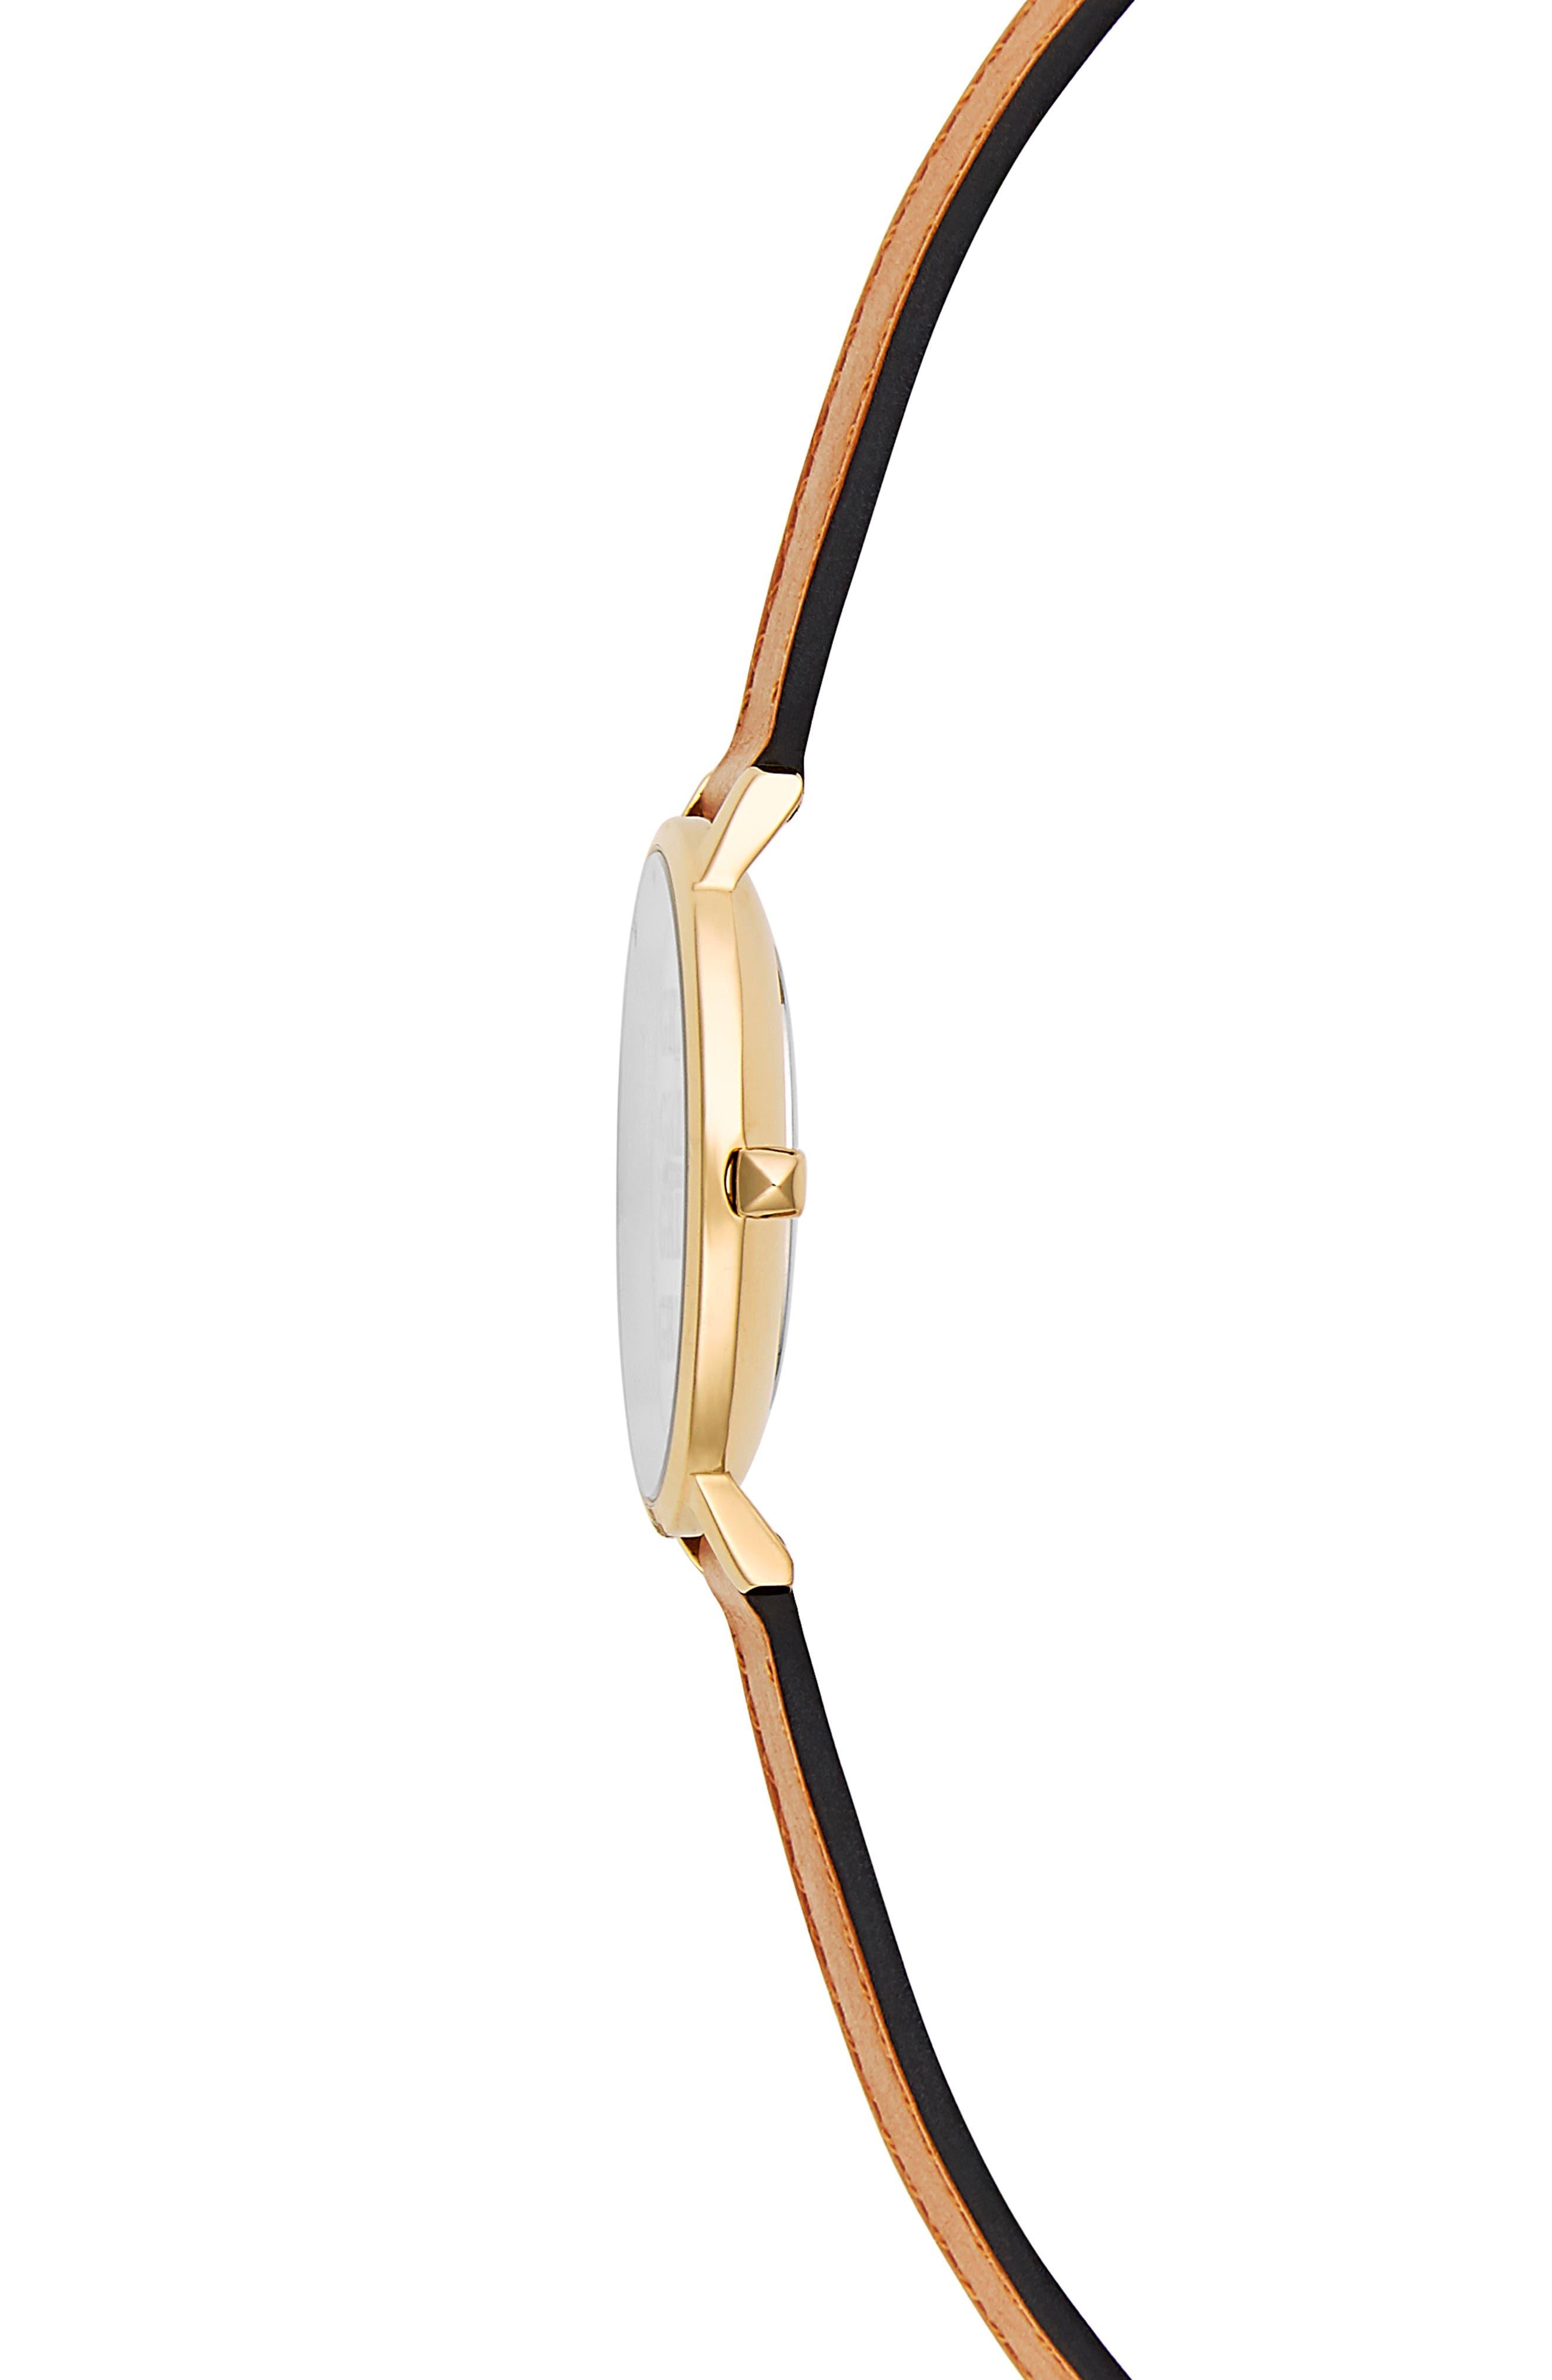 REBECCA MINKOFF,                             Rebeca Minkoff Major GRL PWR Leather Strap Watch, 35mm,                             Alternate thumbnail 3, color,                             200